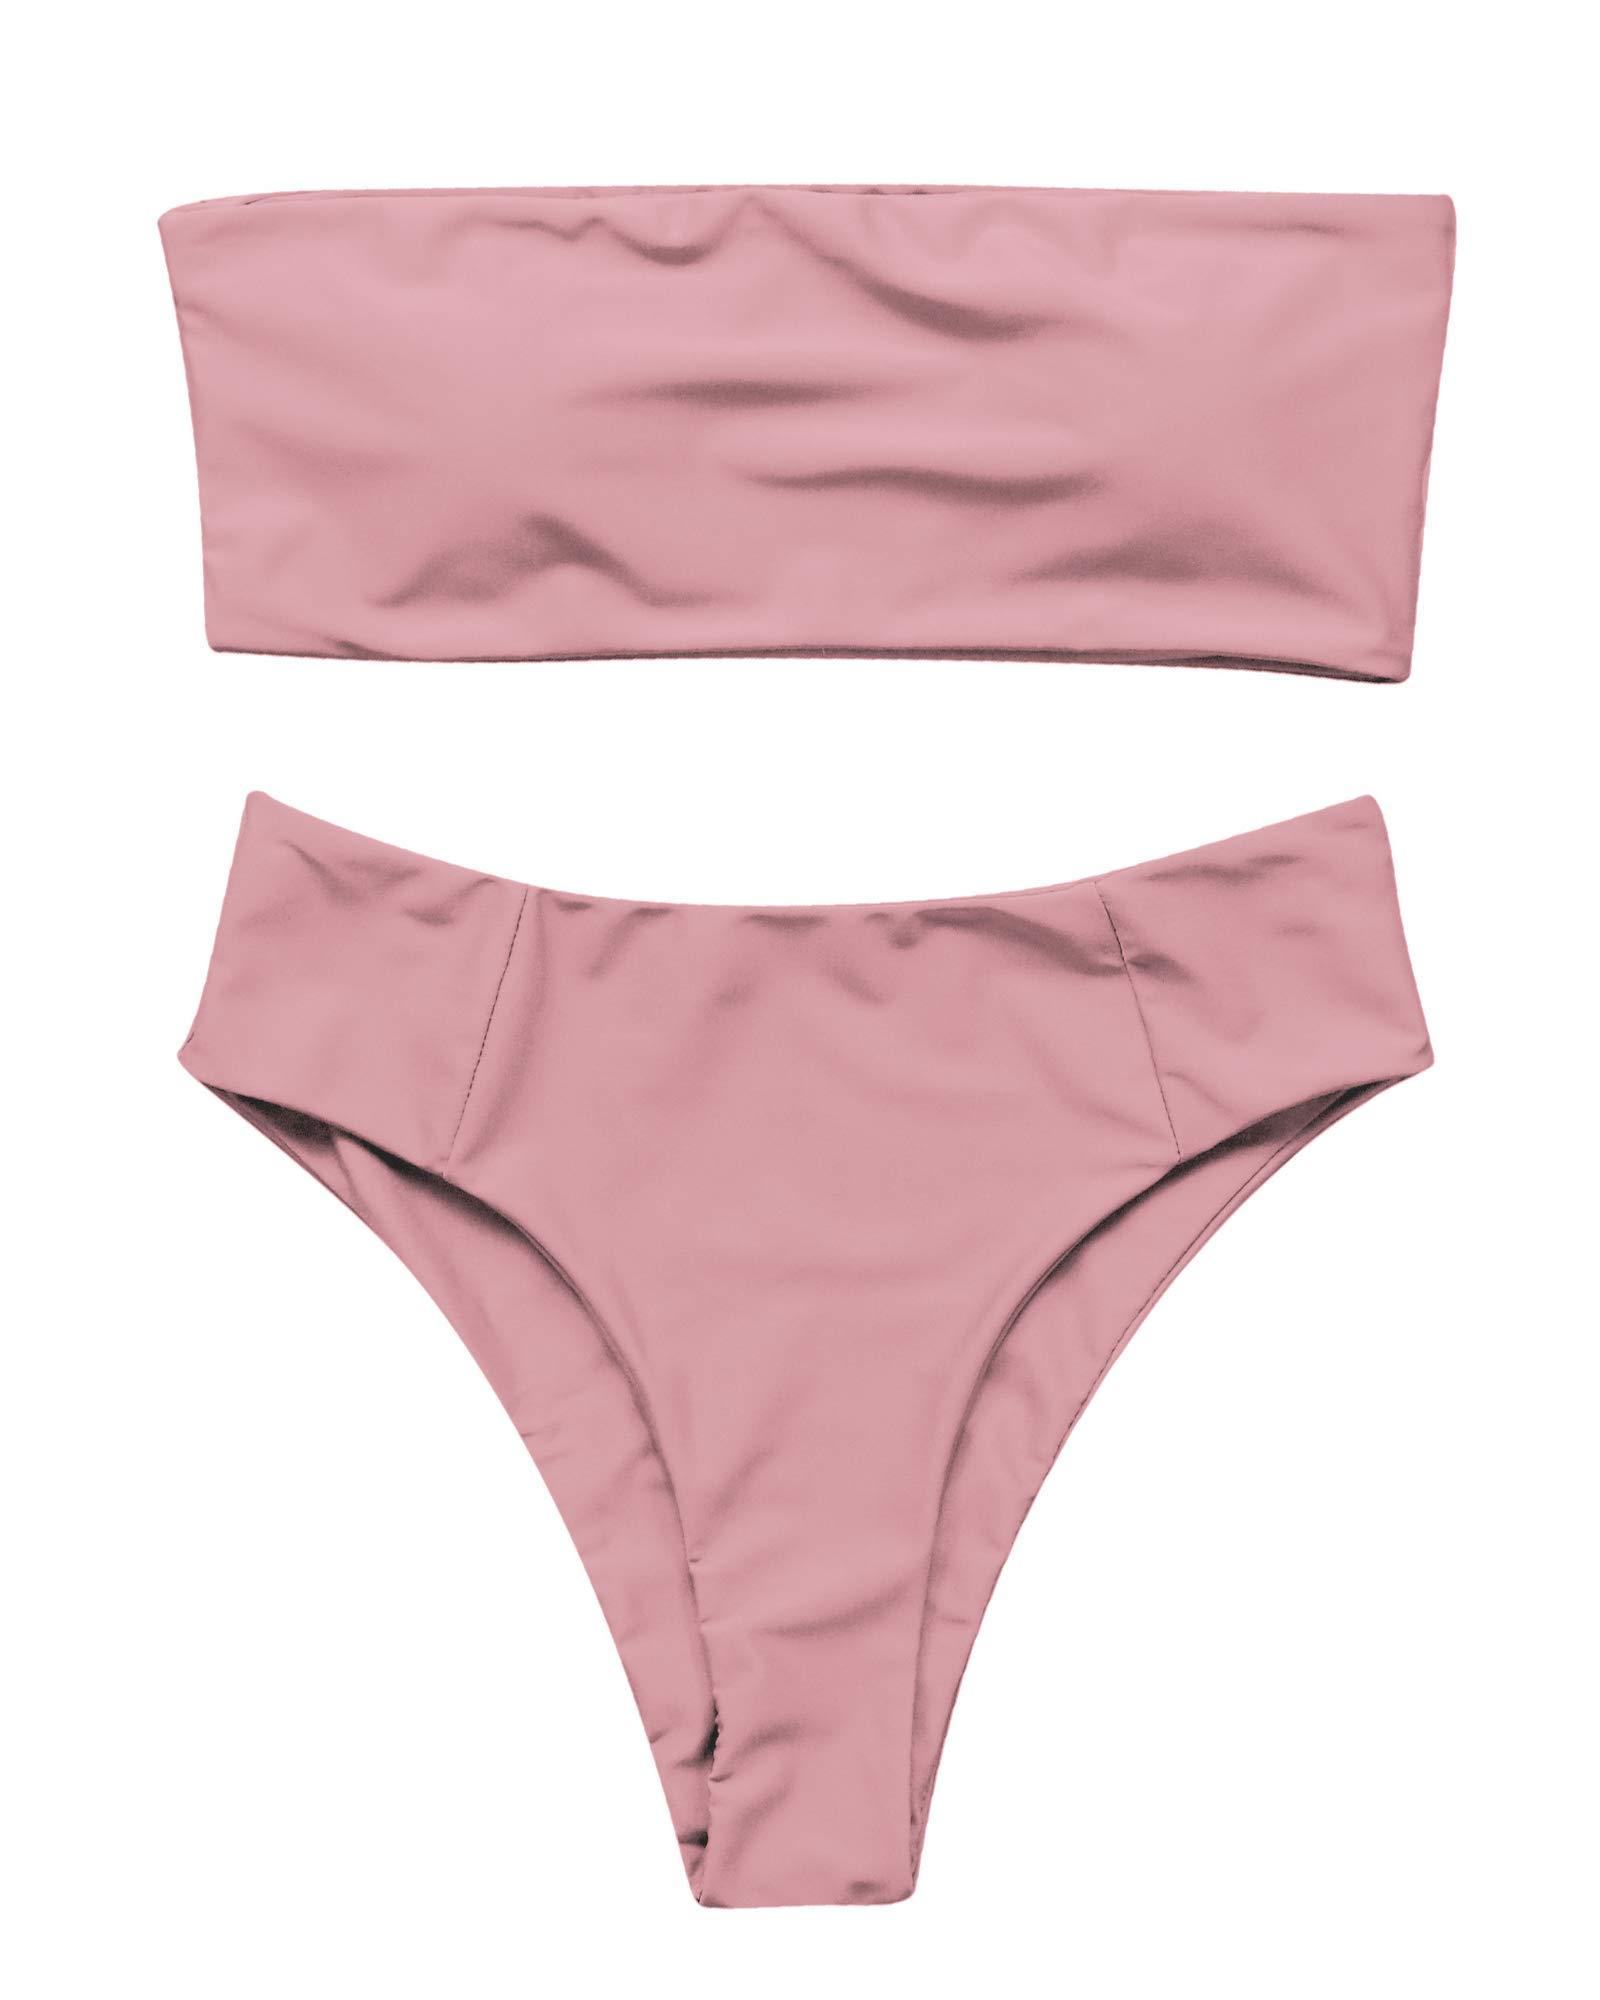 f64074368b1 OMKAGI Women's 2 Pieces Bandeau Bikini Swimsuits Off Shoulder High Waist  Bathing Suit High Cut product